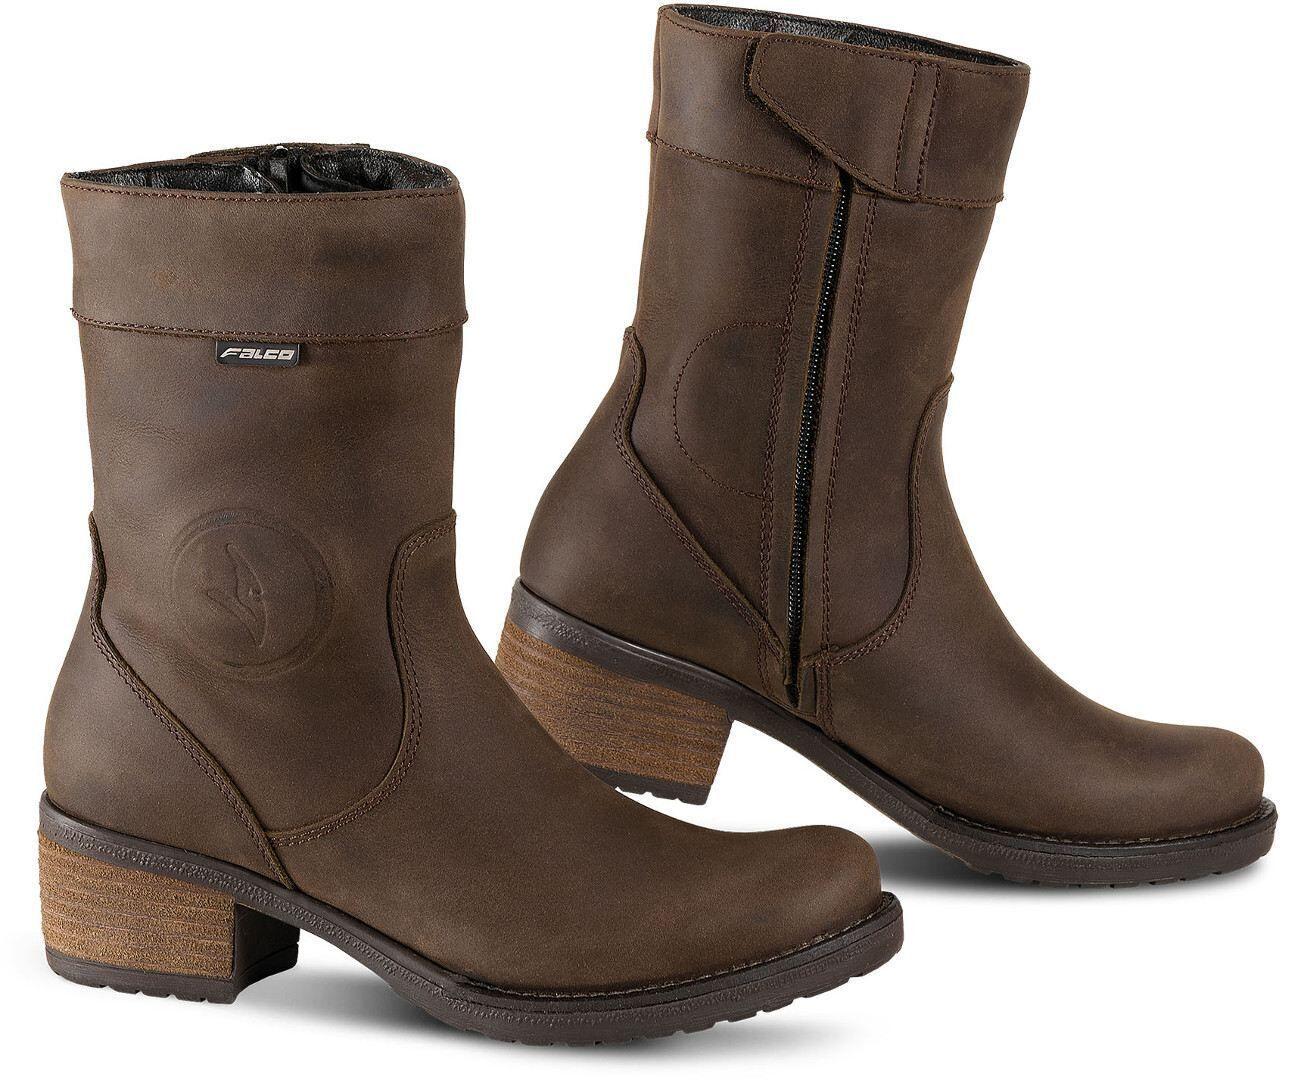 Falco Ayda 2 Ladies Motorcycle Boots Brown 39